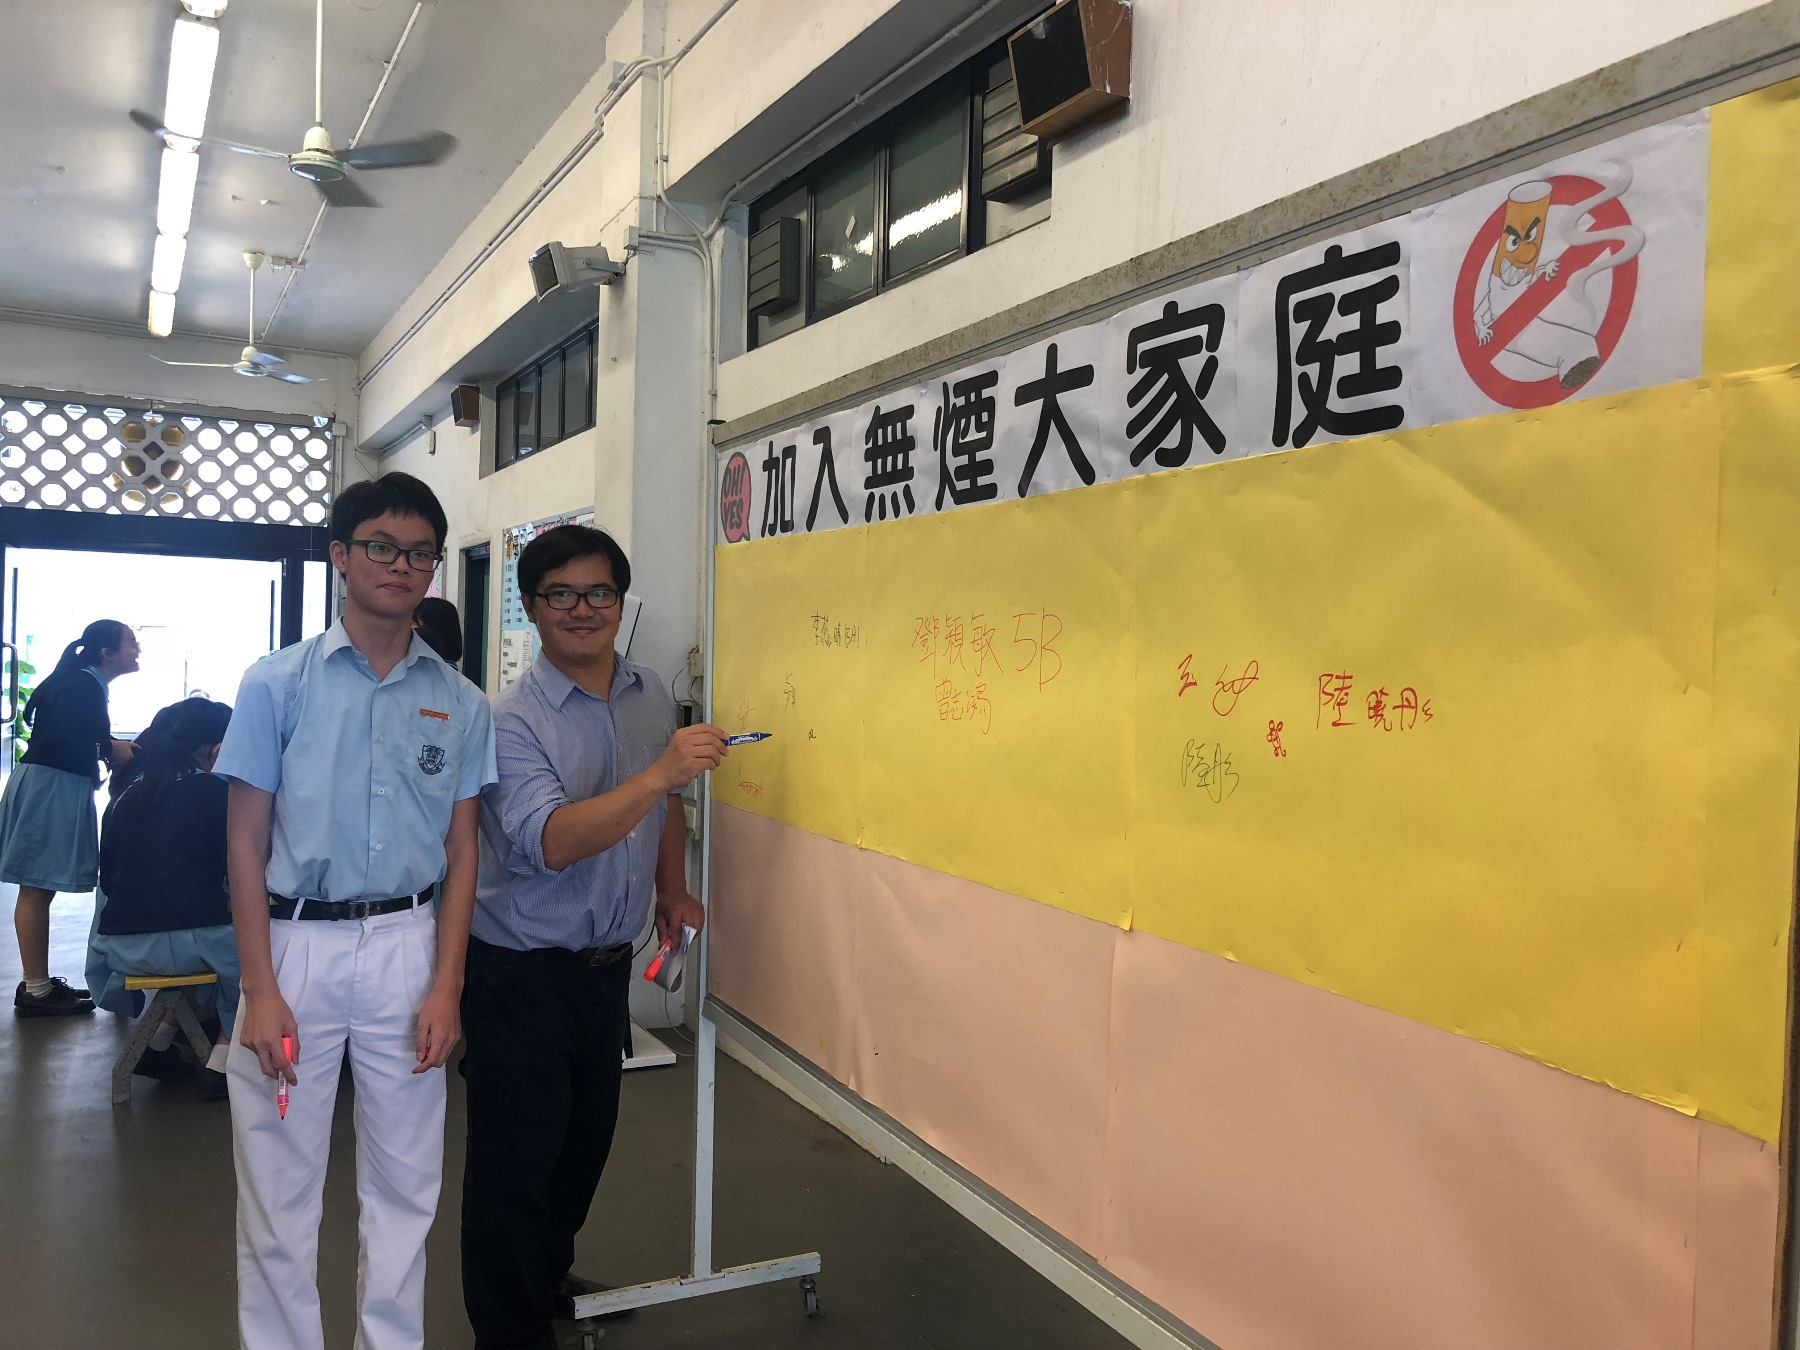 http://npc.edu.hk/sites/default/files/img_8023.jpg